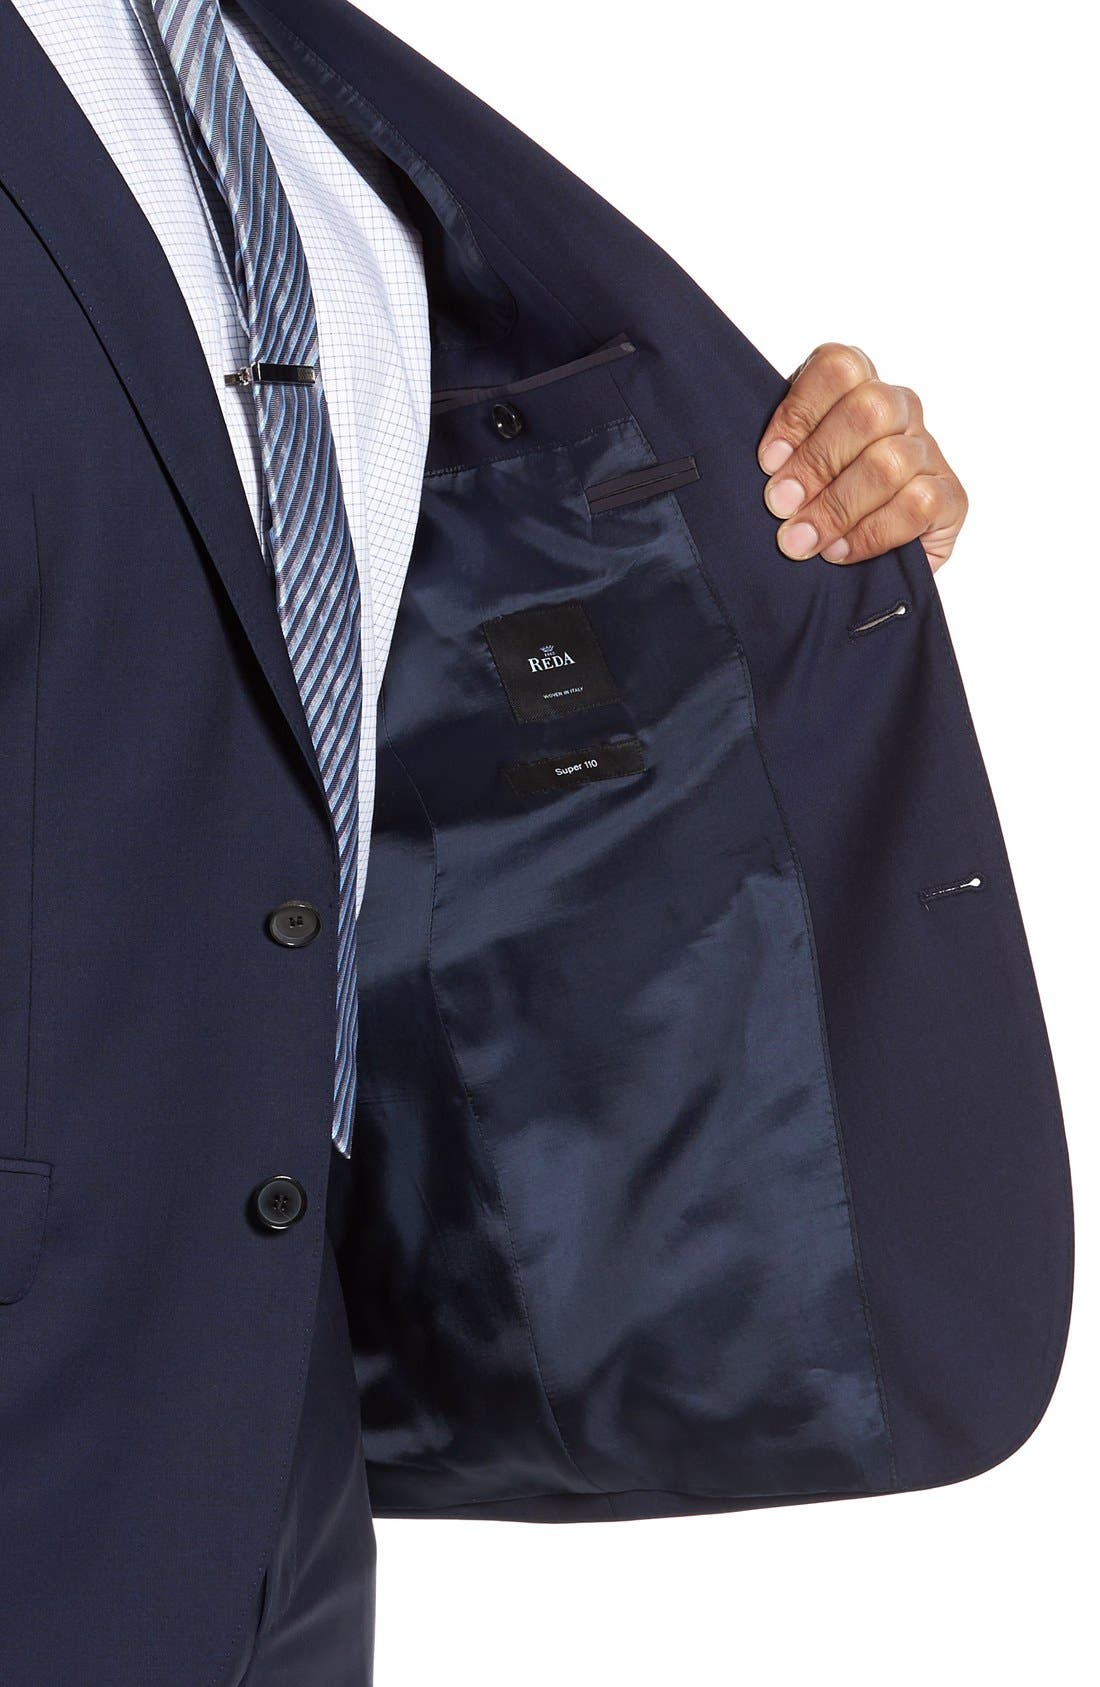 BOSS, Huge/Genius Trim Fit Navy Wool Suit, Alternate thumbnail 5, color, 410